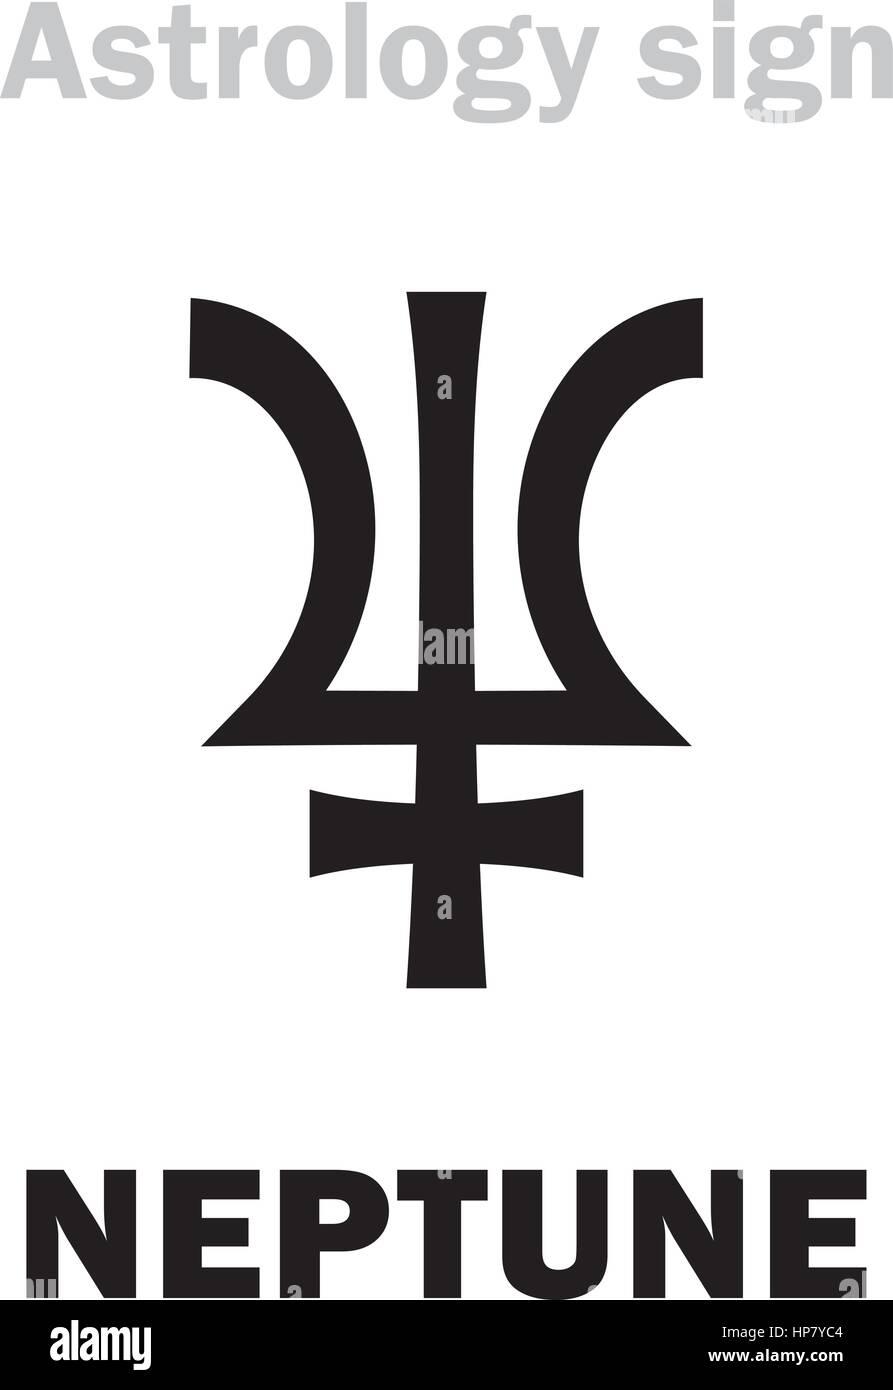 Astrology alphabet neptune poseidon higher global planet stock astrology alphabet neptune poseidon higher global planet hieroglyphics character sign single symbol biocorpaavc Image collections